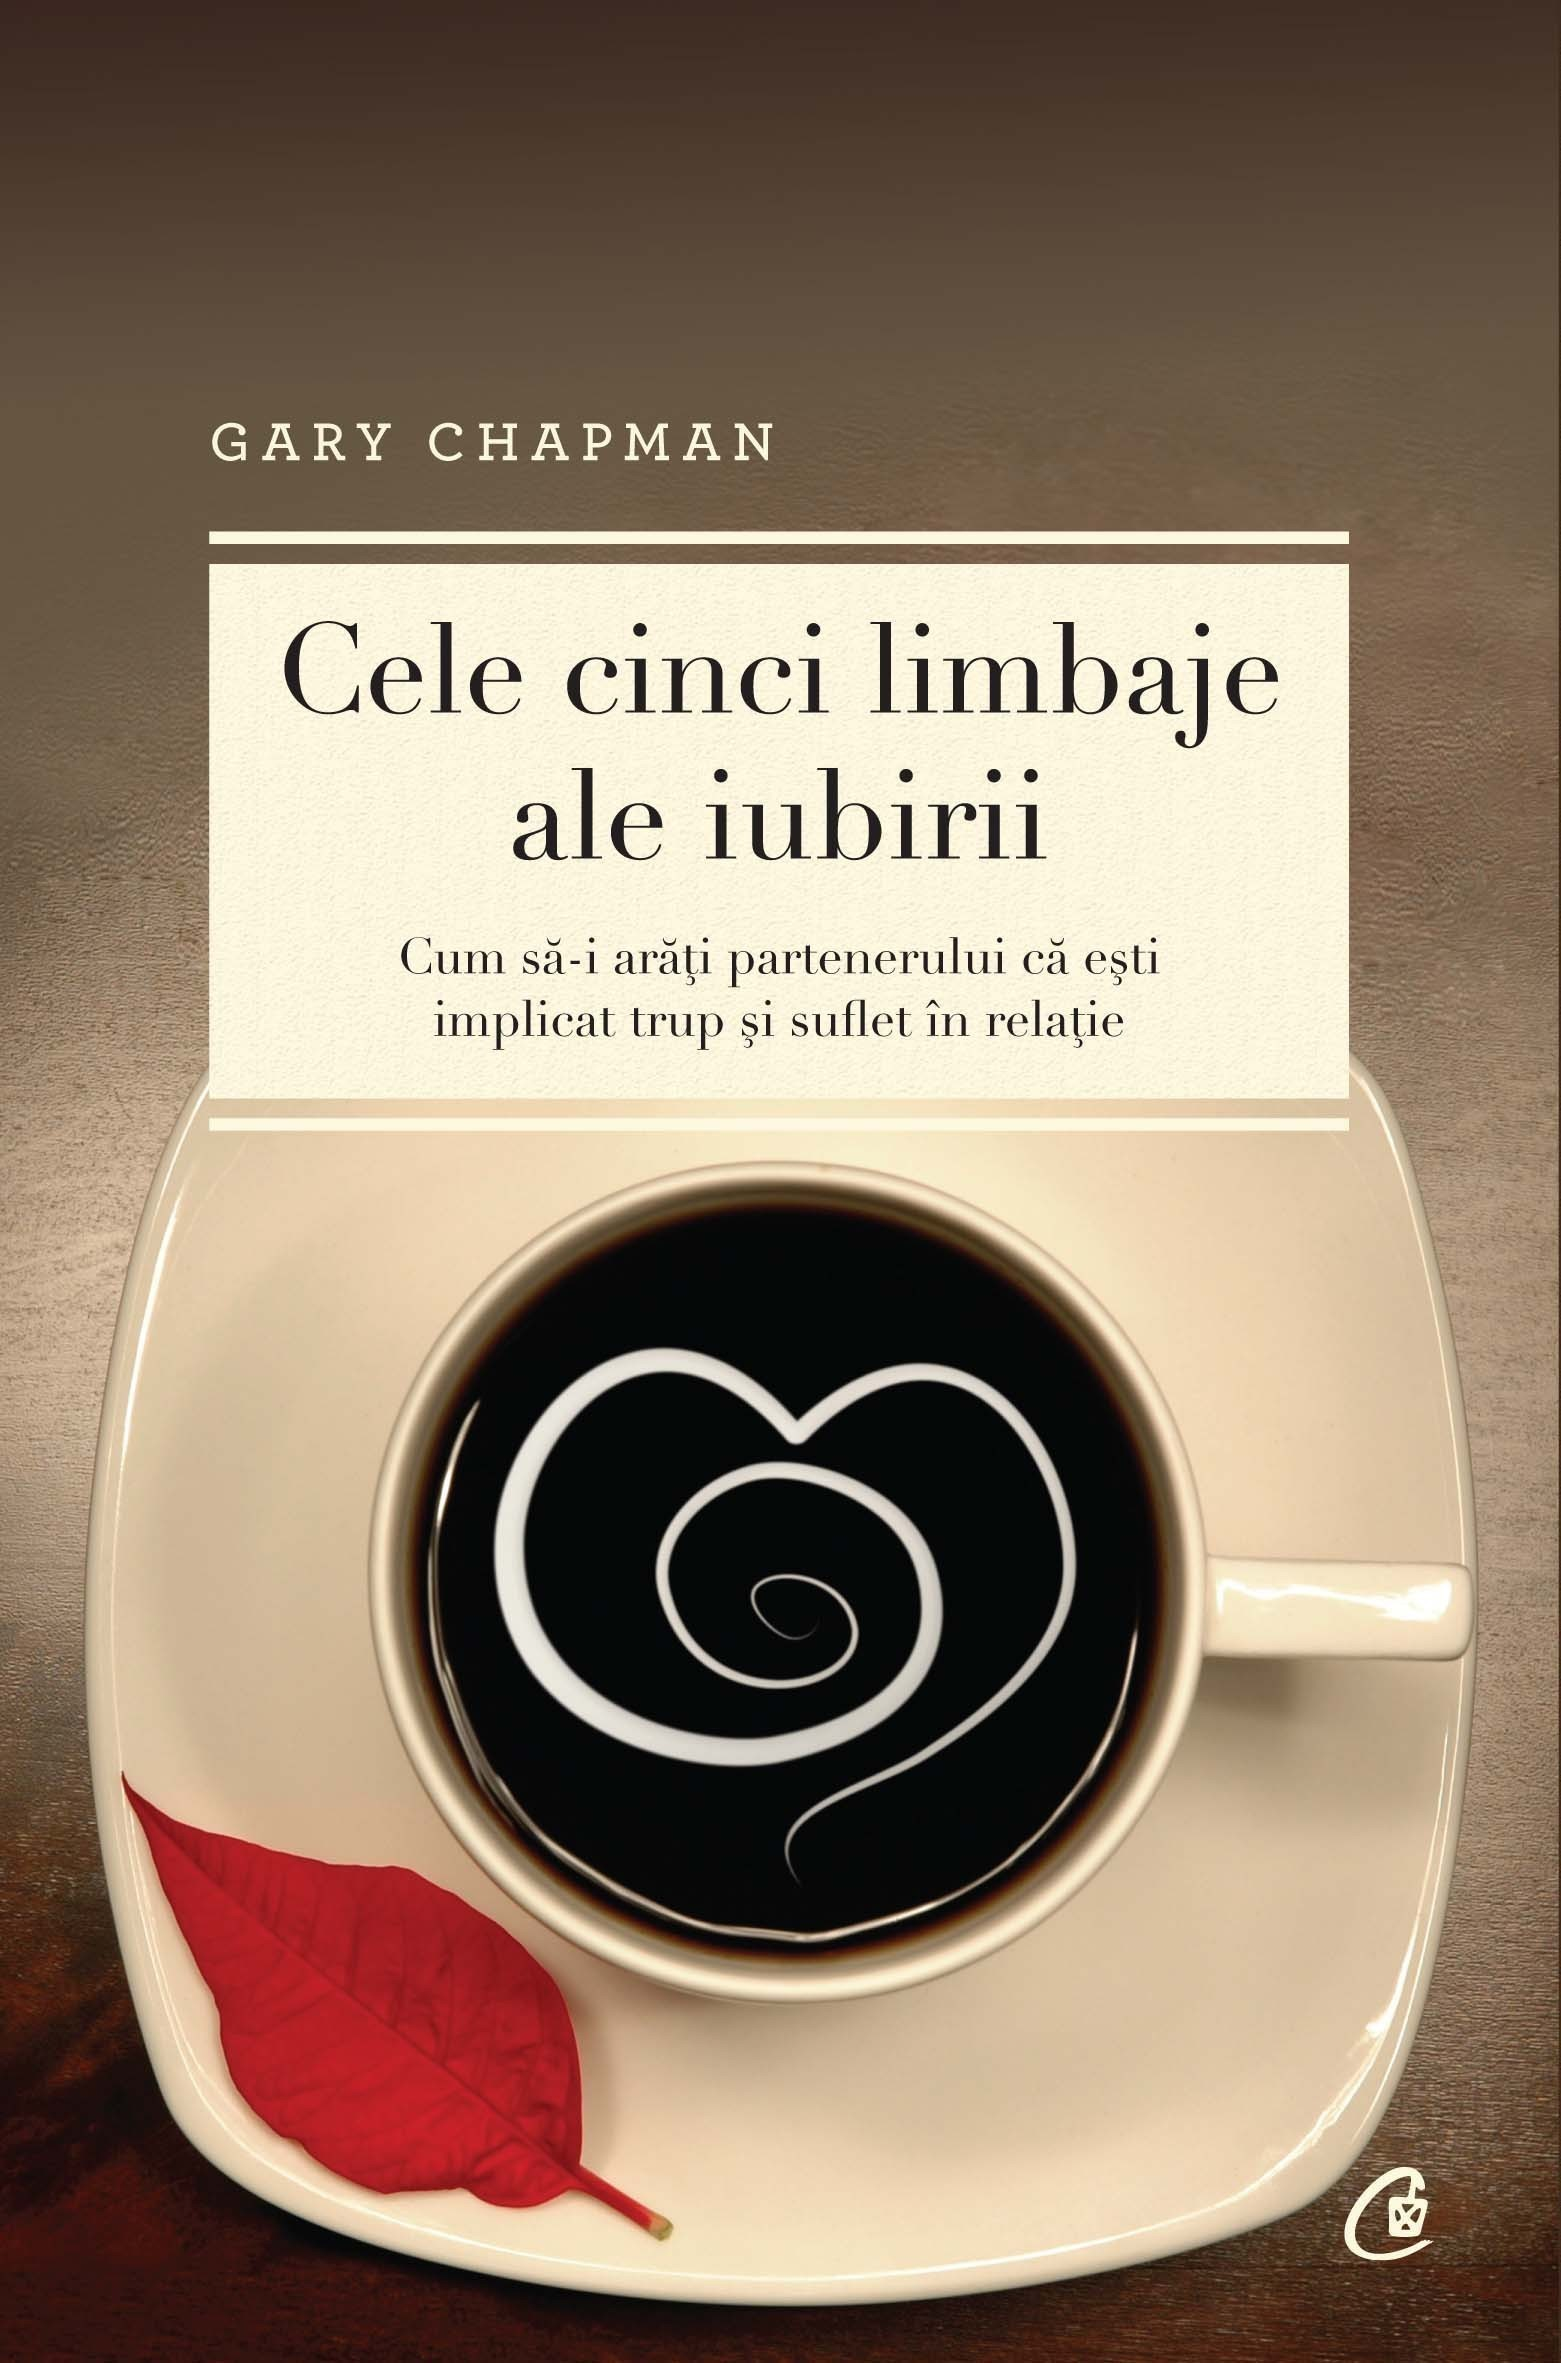 Gary Chapman - Cele cinci limbaje ale iubirii - Editia a V-a -